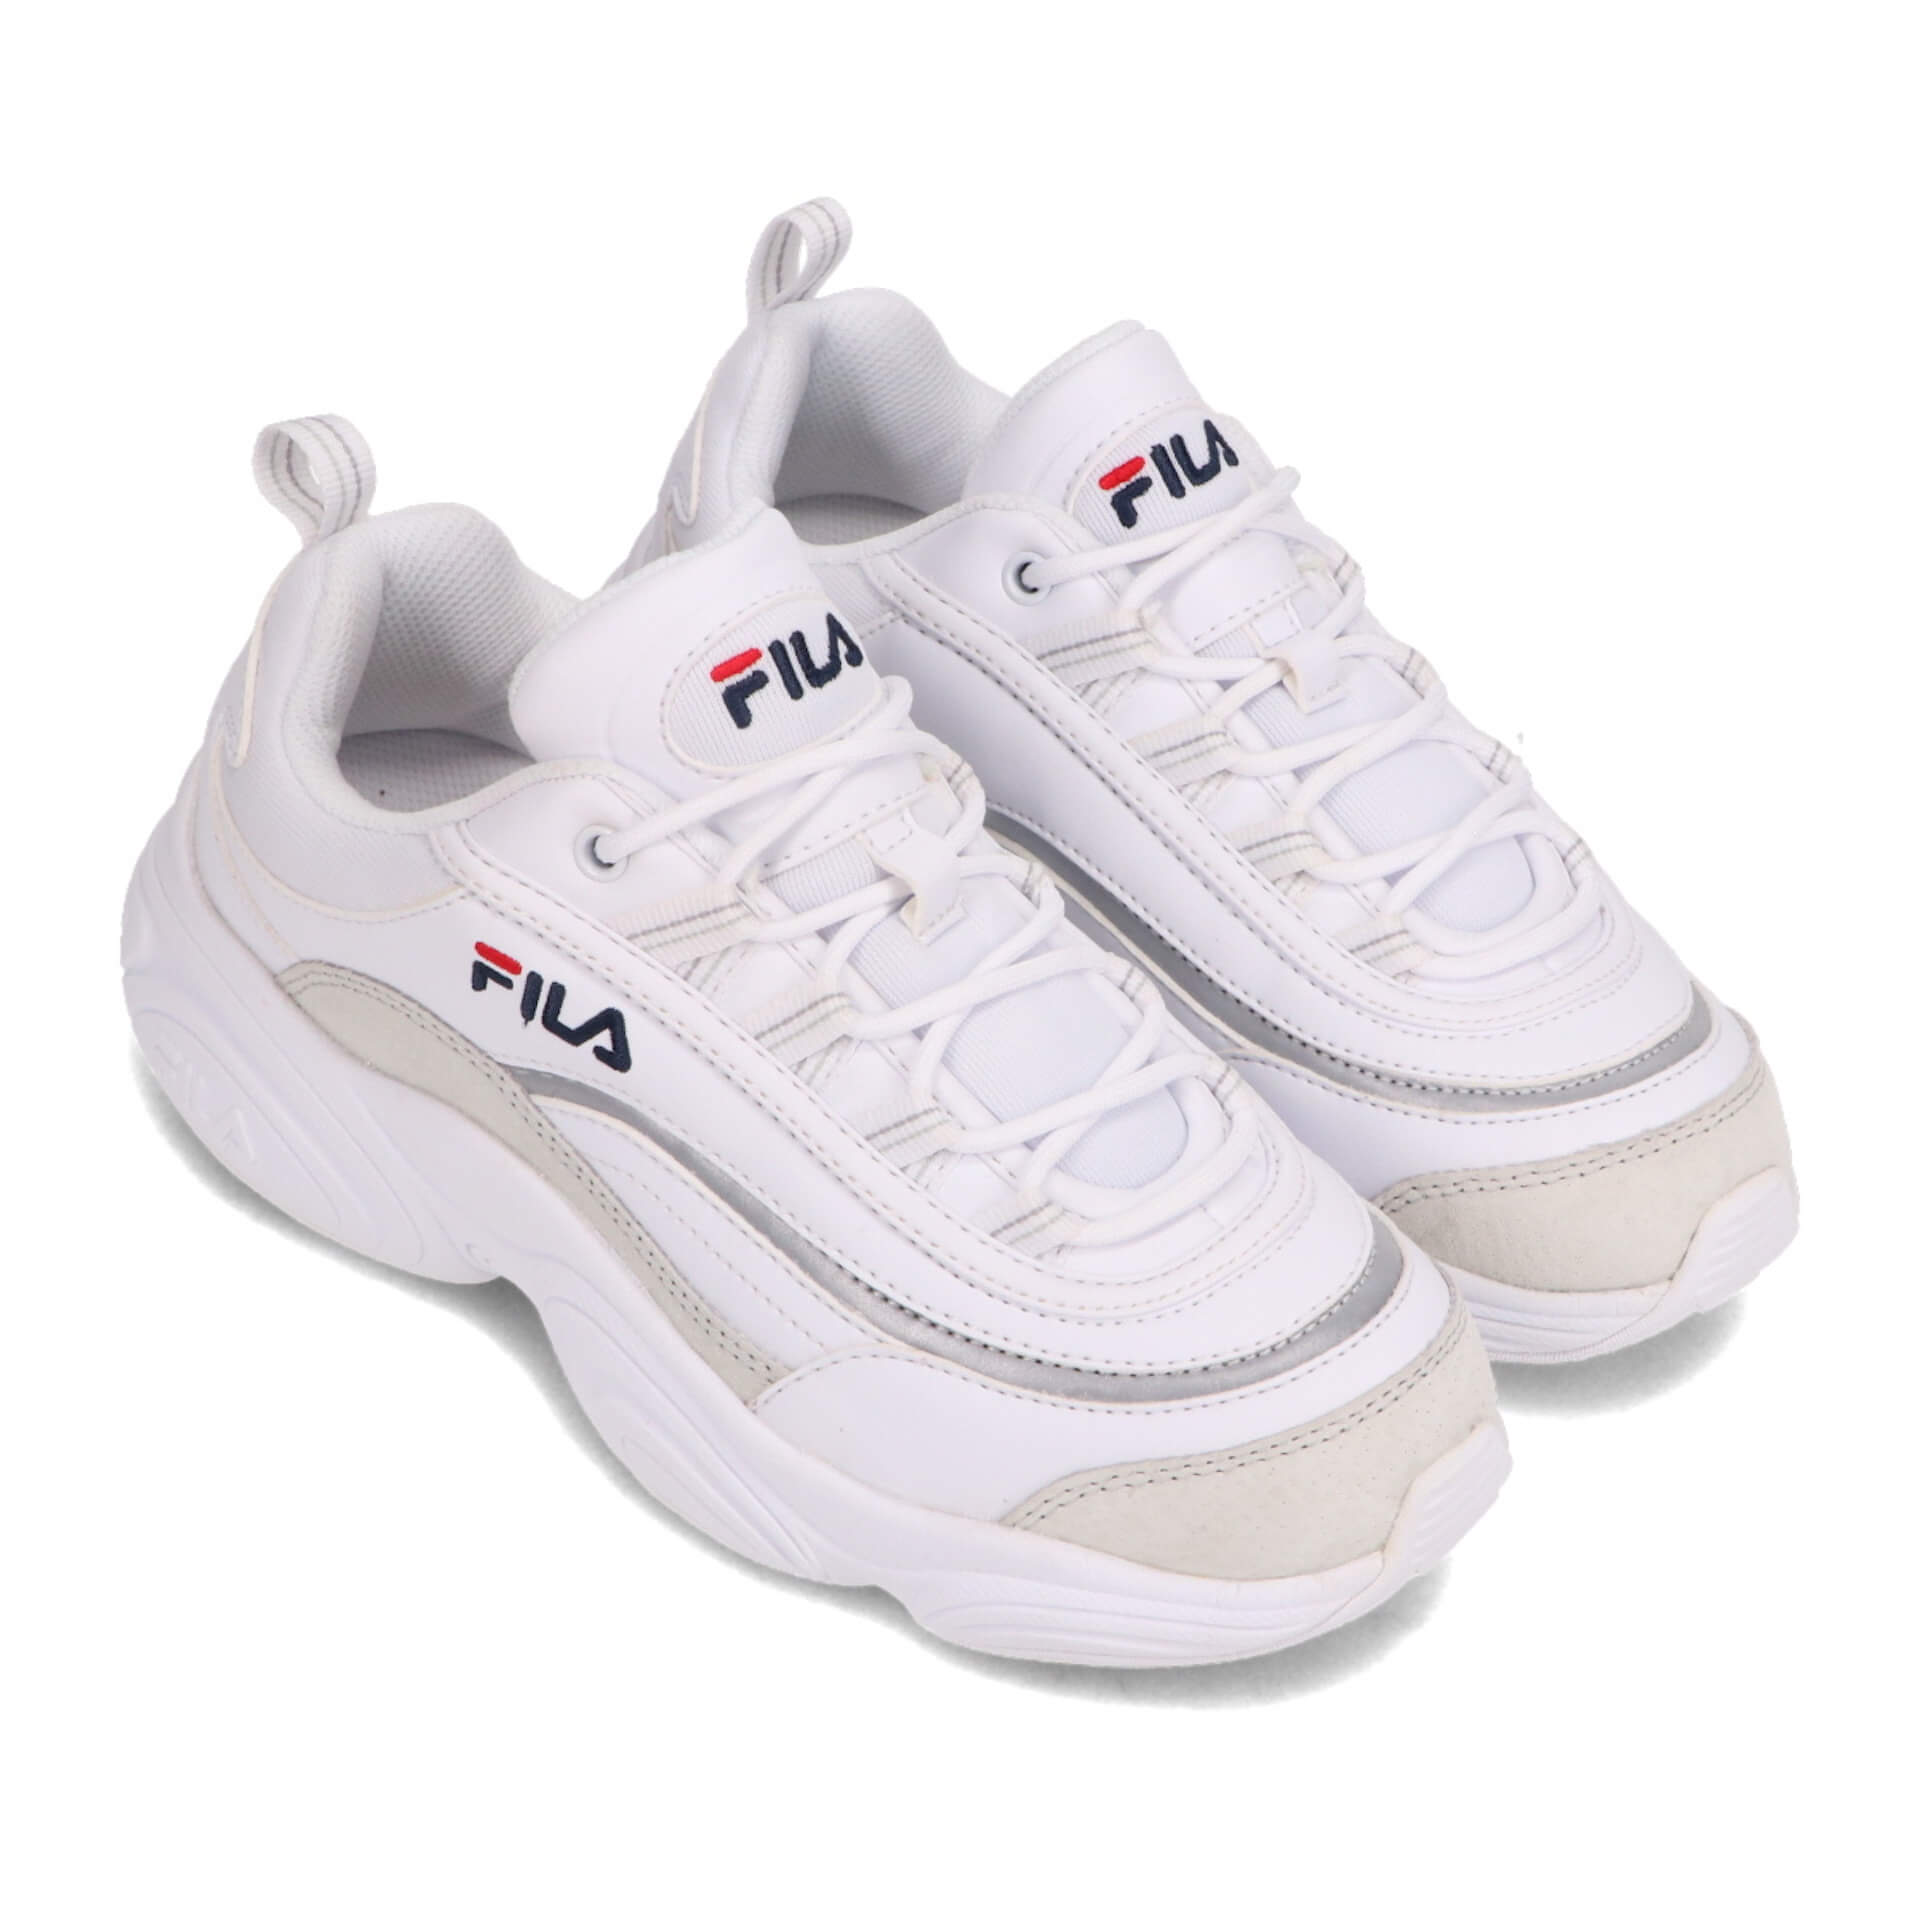 FILAの人気モデル『INTERATION』と『Z BUFFER2』にブラックベースが登場!『RAY RUN』ニューカラーもatmos系列限定で発売 fashion201216_atmos_fila_14